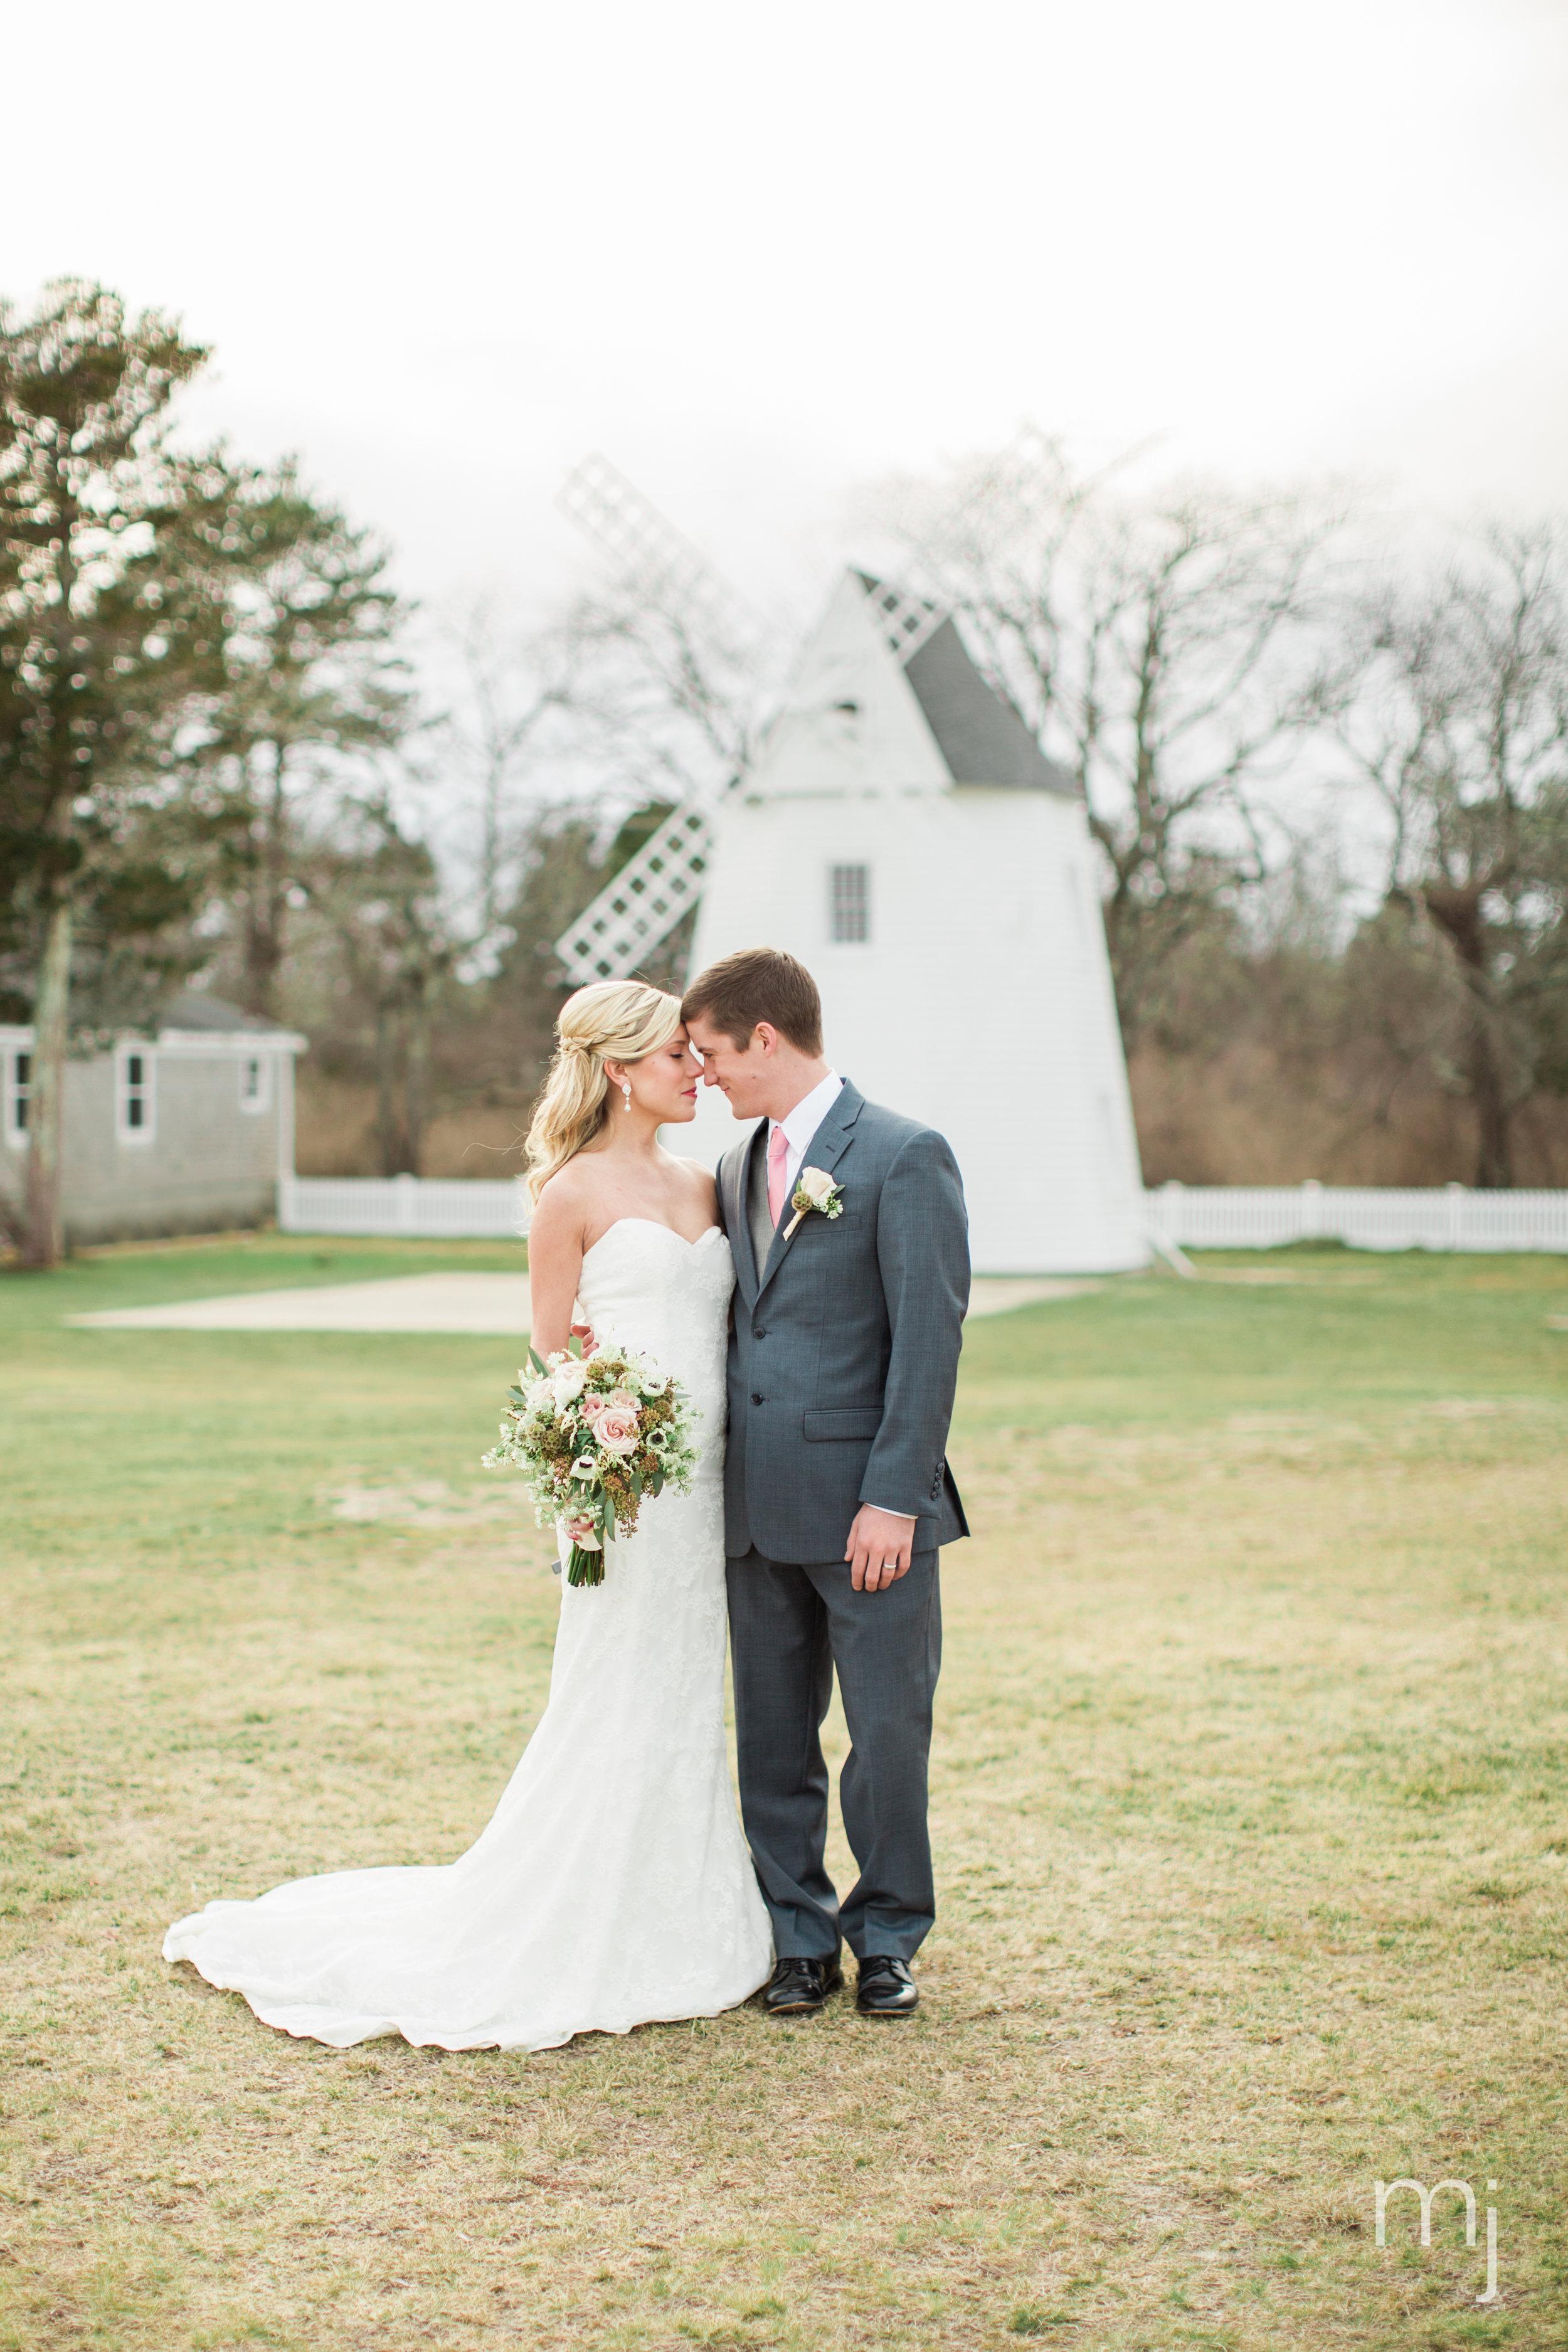 traveler-suitcase-wedding-aviator-airfield-cape-cod-marston-mills-boston-wedding-photographer-0376.jpg